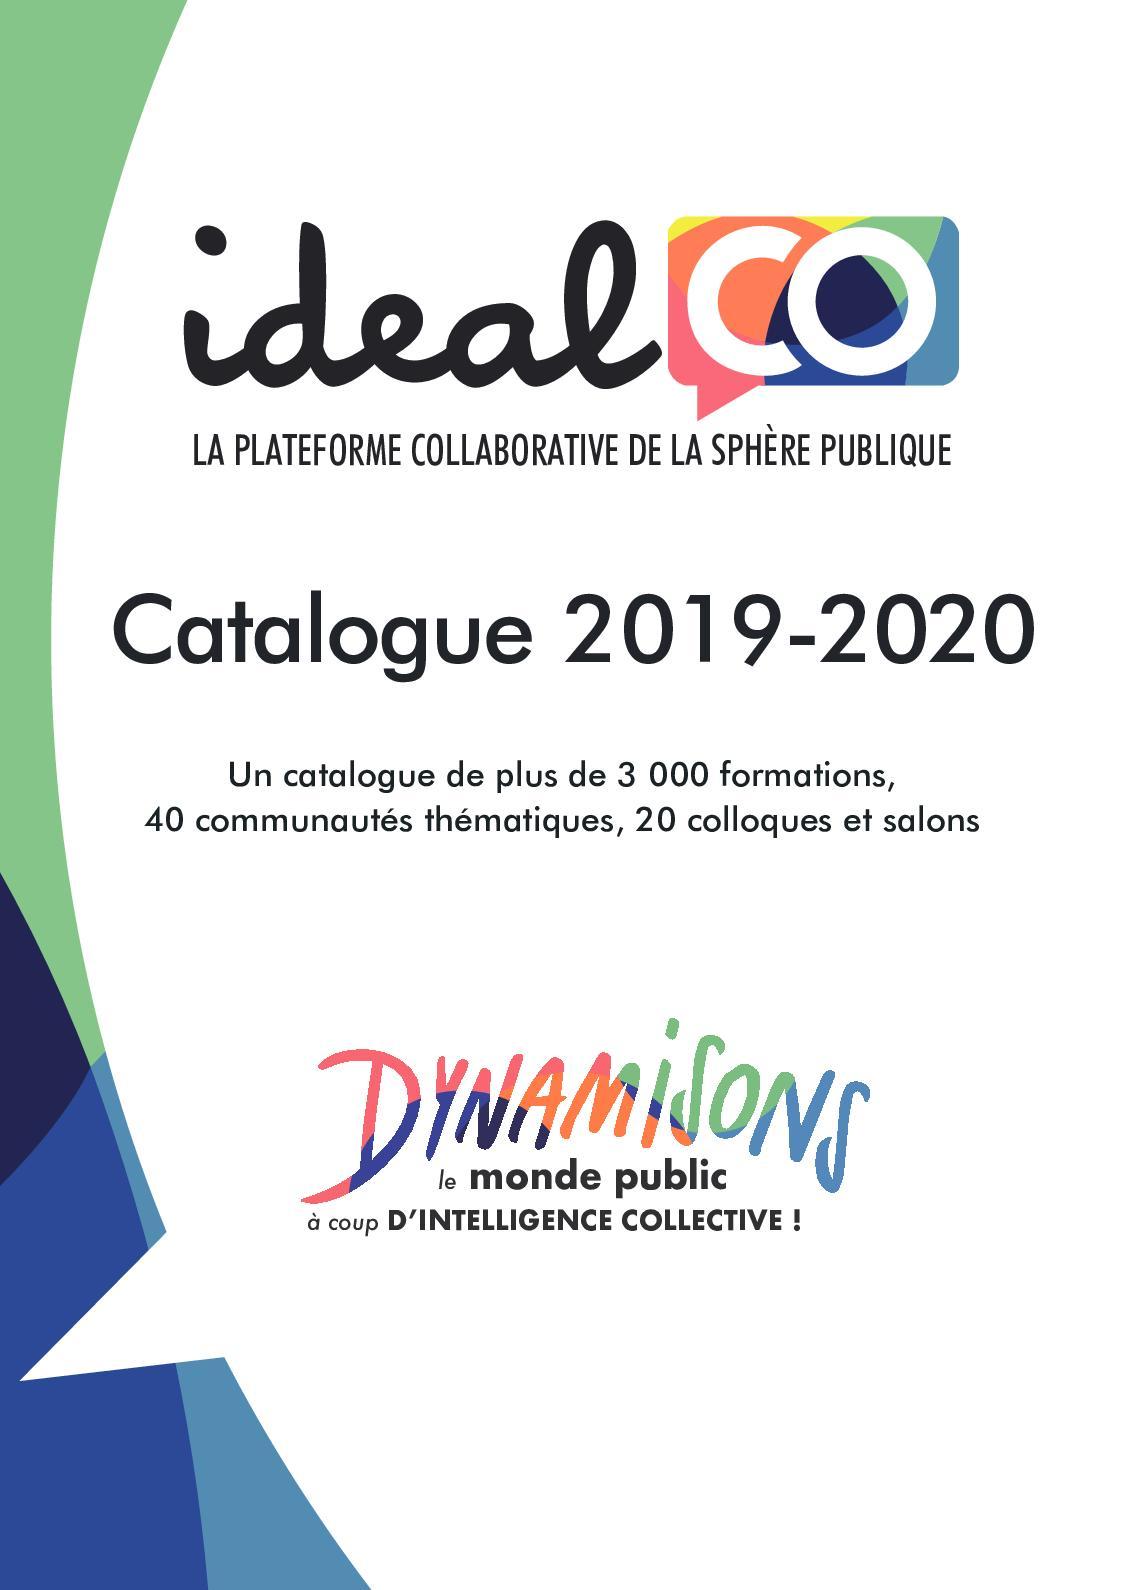 Cdg59 Calendrier Concours 2020.Calameo Catalogue 2019 2020